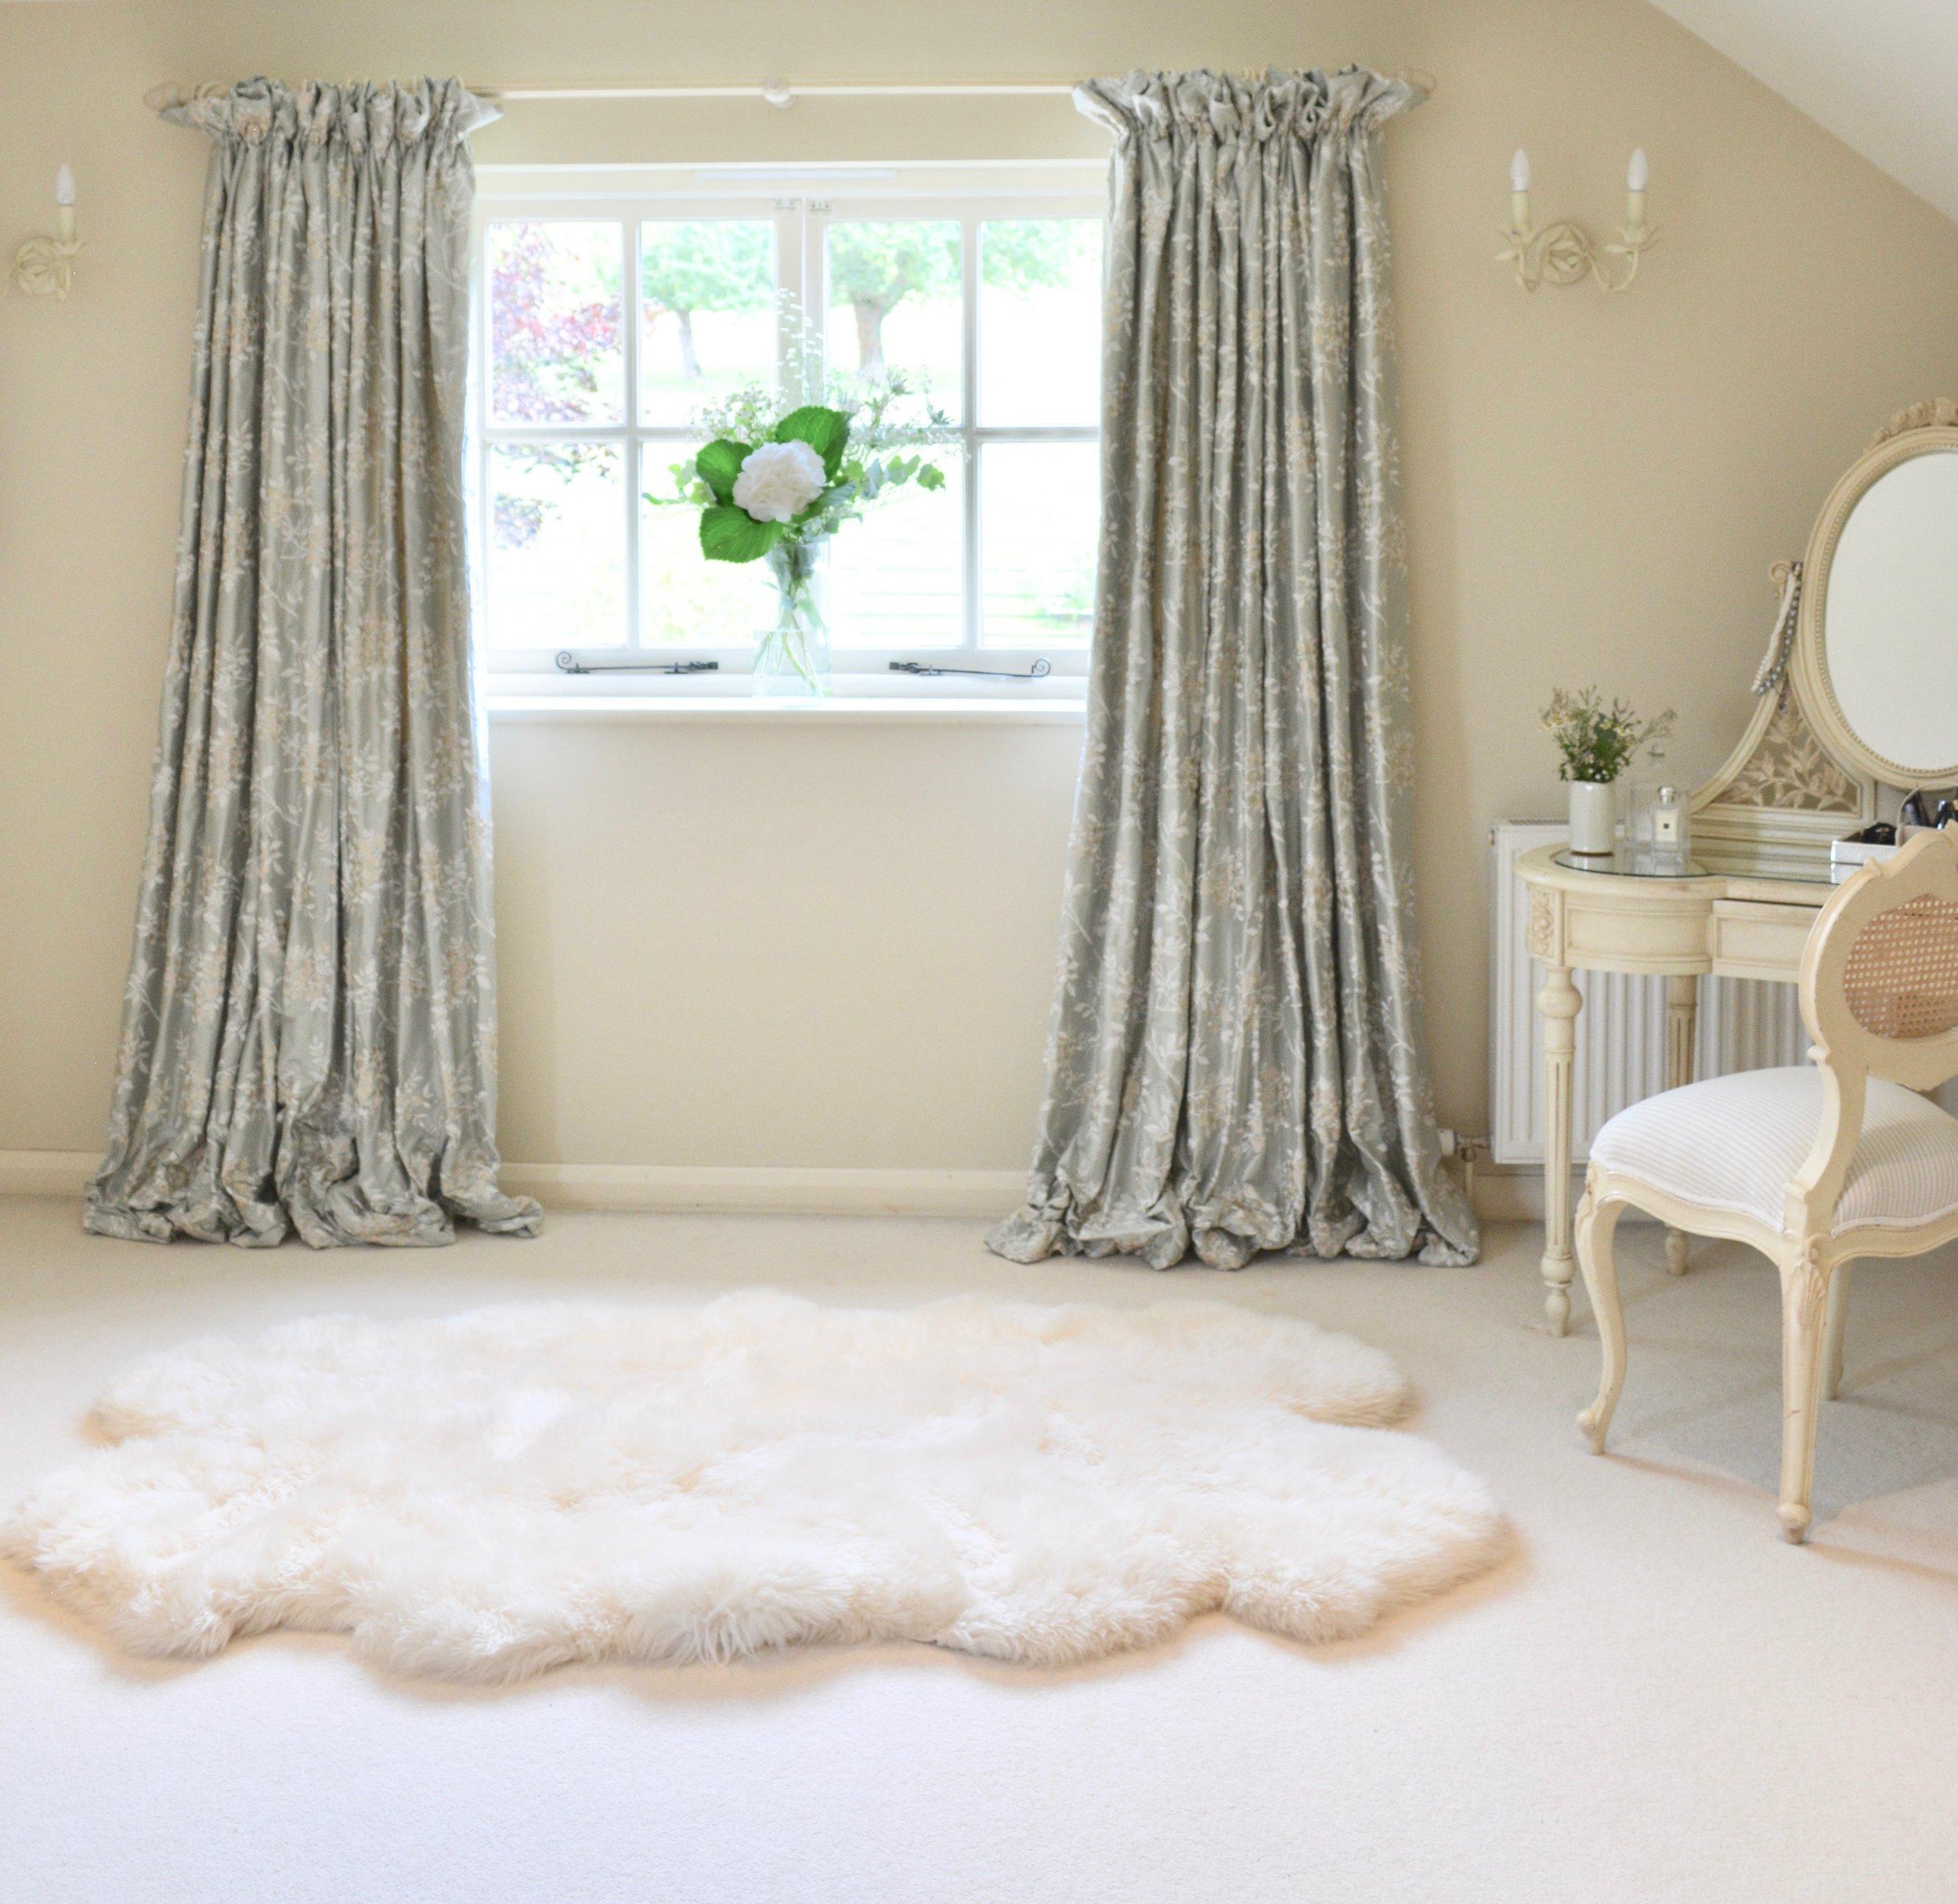 Country Cottage Bedroom Designed by Hannah Llewelyn Interior Design www.hlinteriors.co.uk 6.jpg